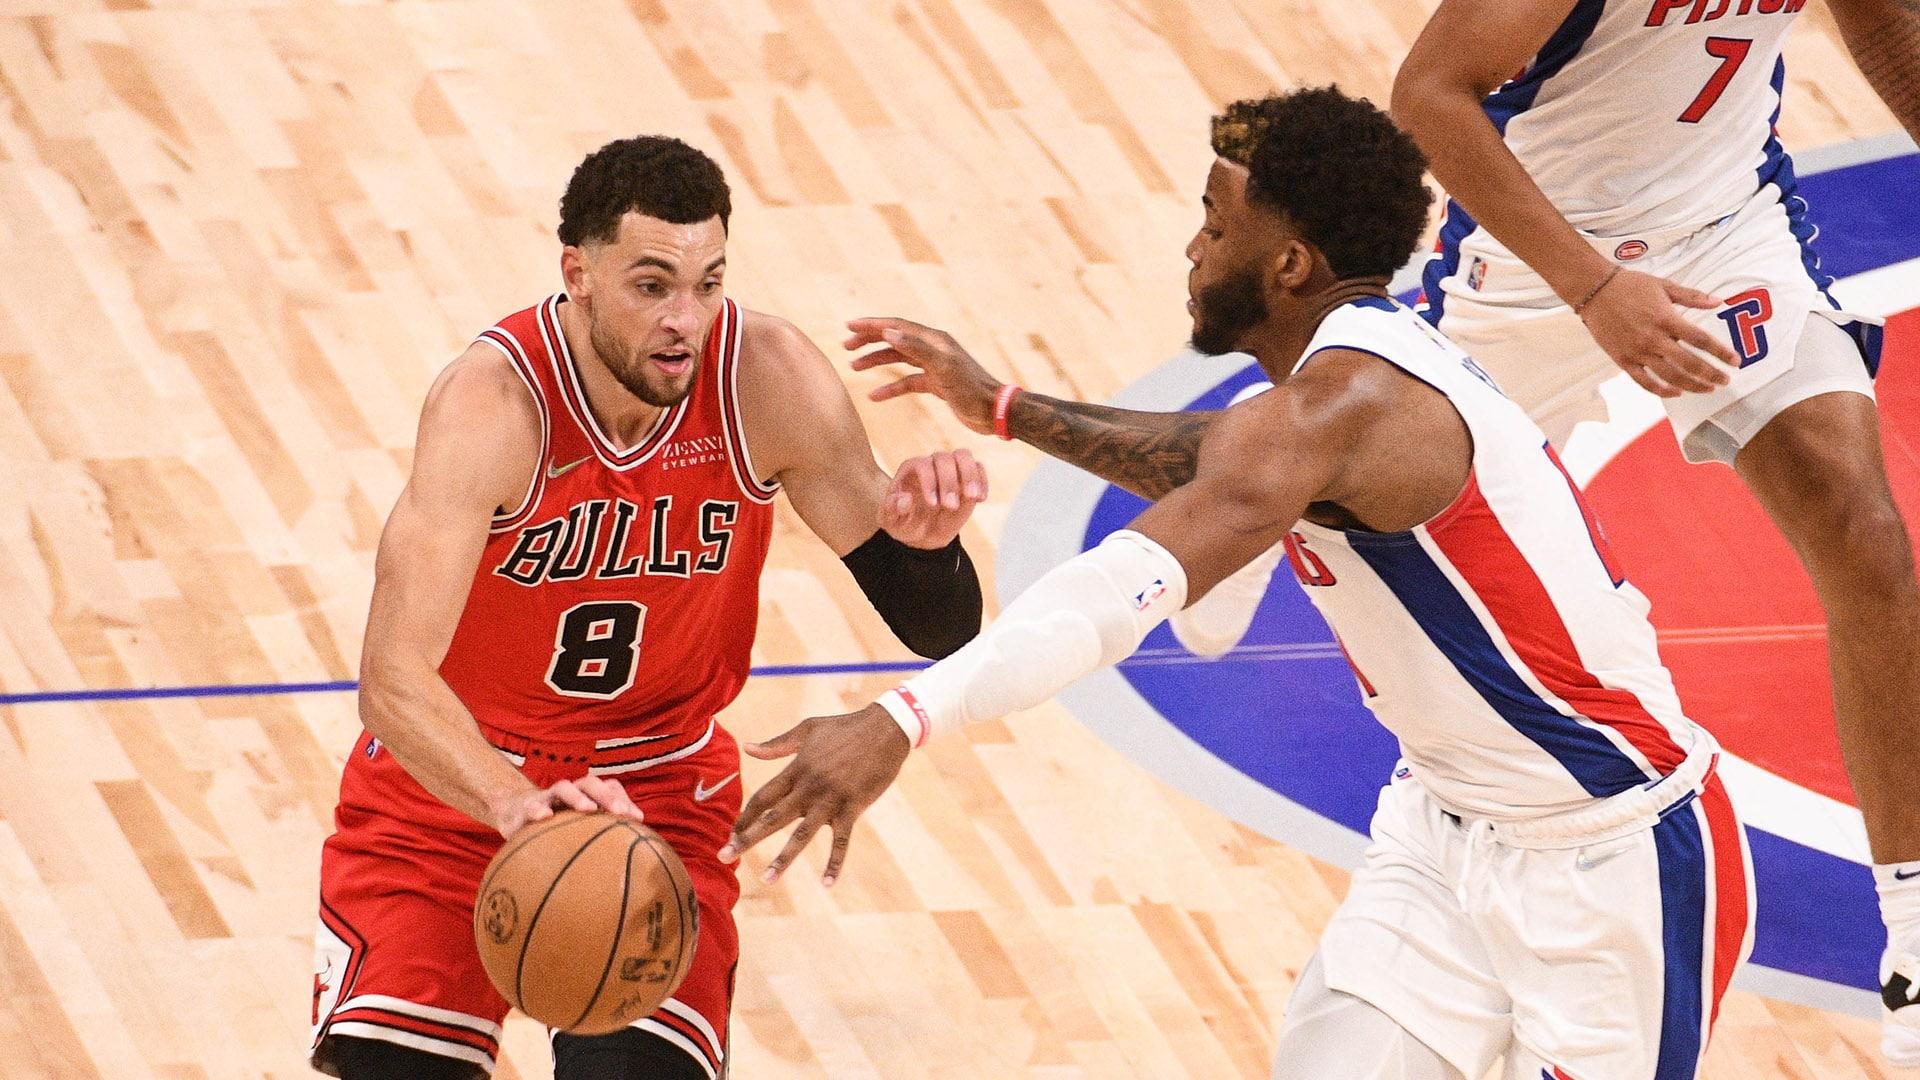 Behind LaVine, new-look Bulls edge Pistons in opener